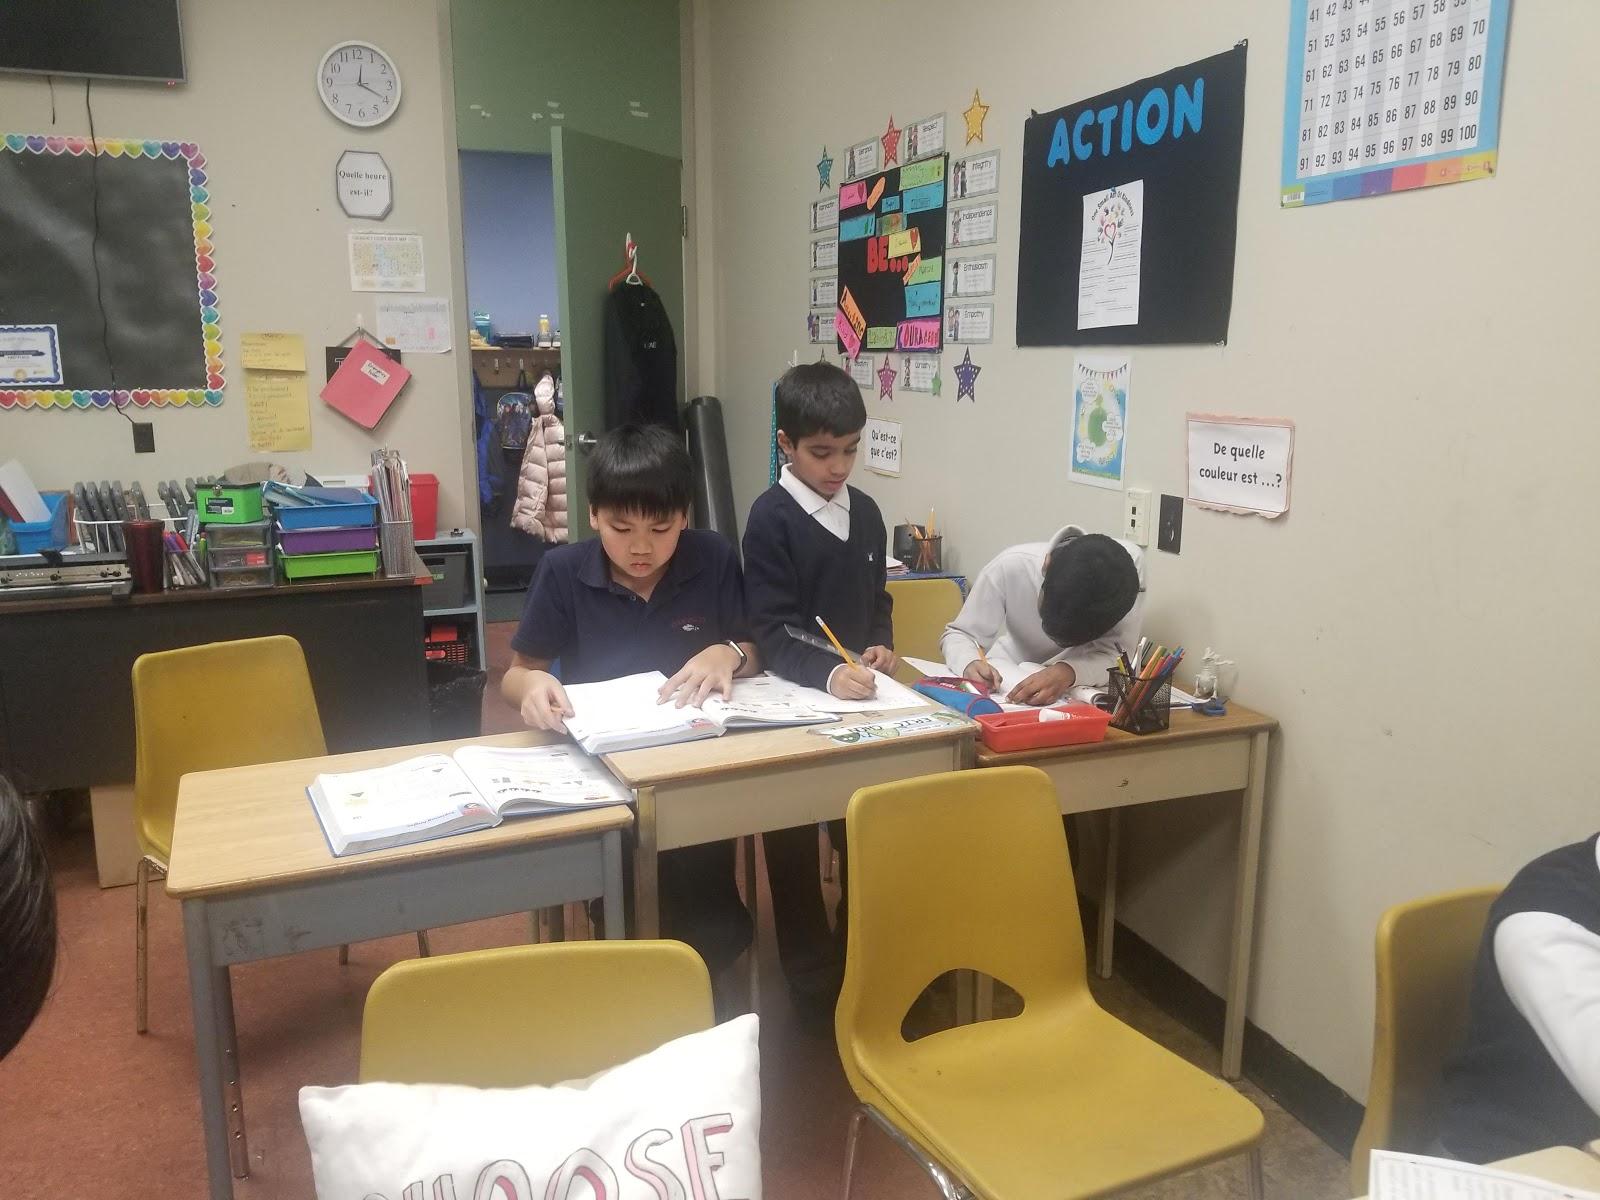 Ms Foti S Grade 3 Class March